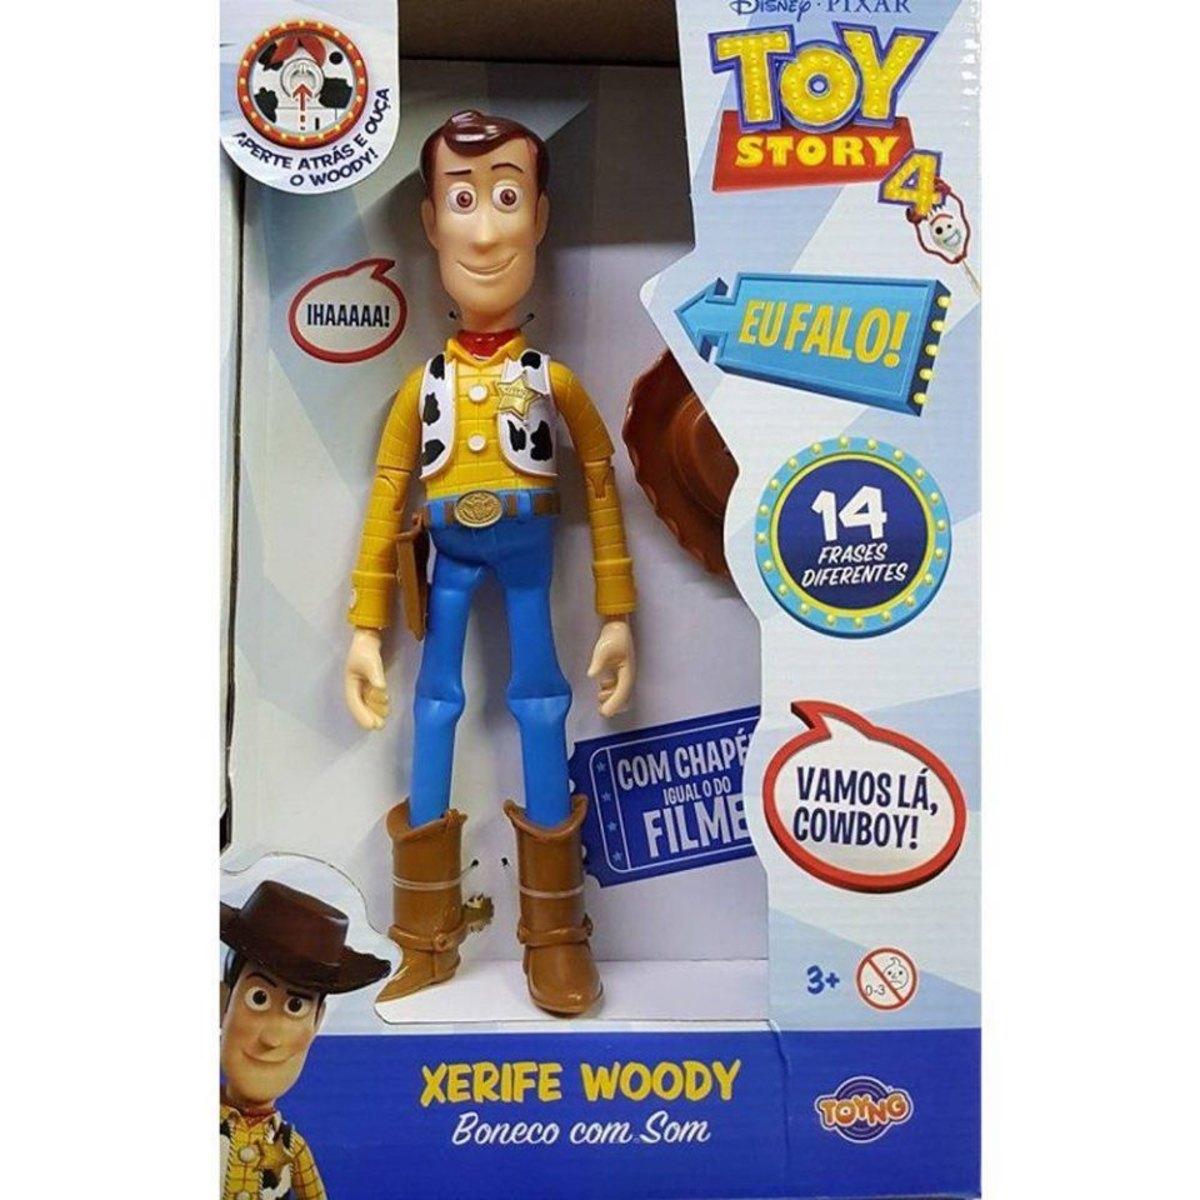 Boneco Toy Story - Woody Falante 14 Frases 30cm Toyng Disney